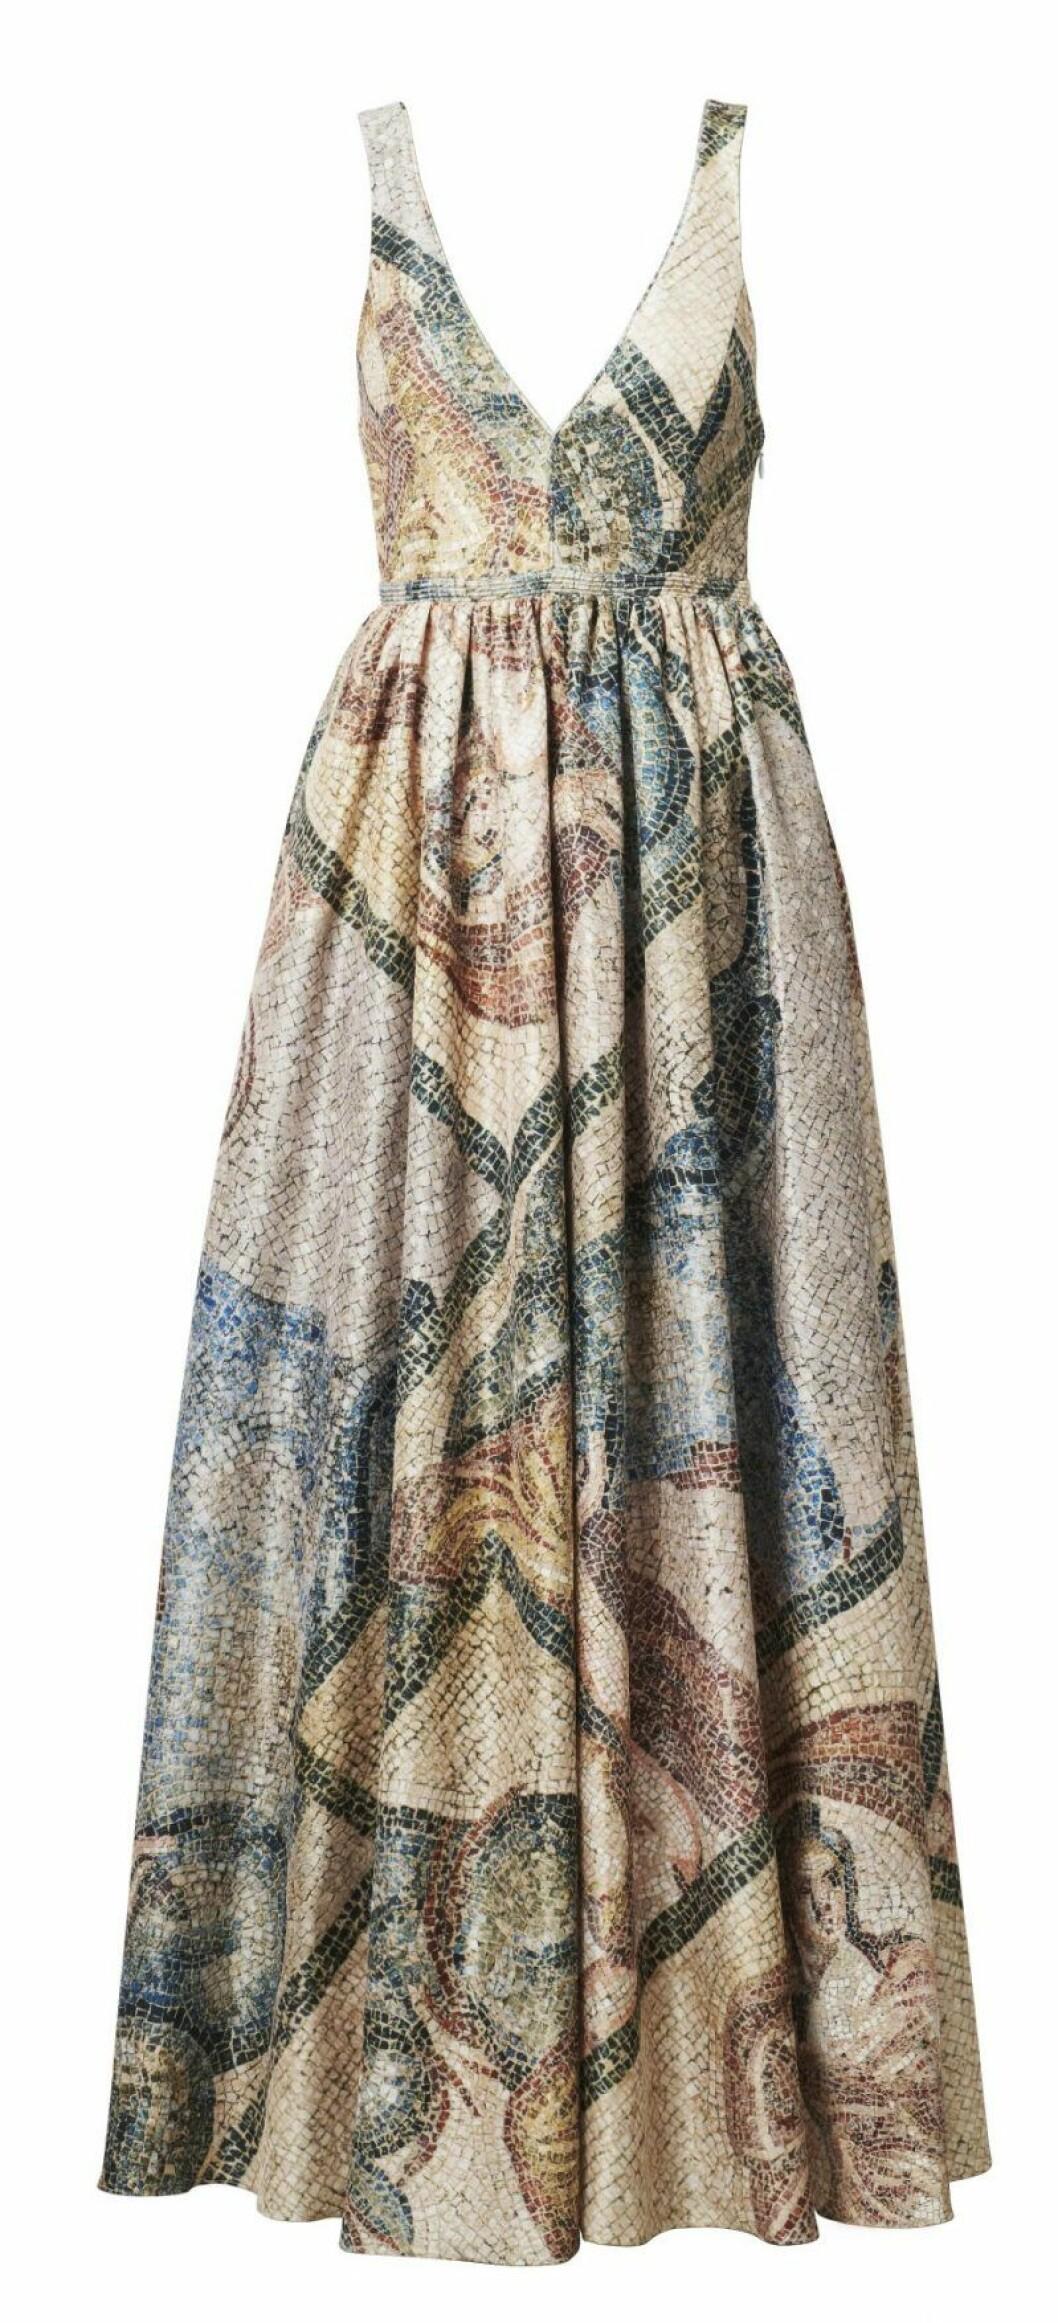 H&M Conscious Exclusive SS20 klänning mönstrad